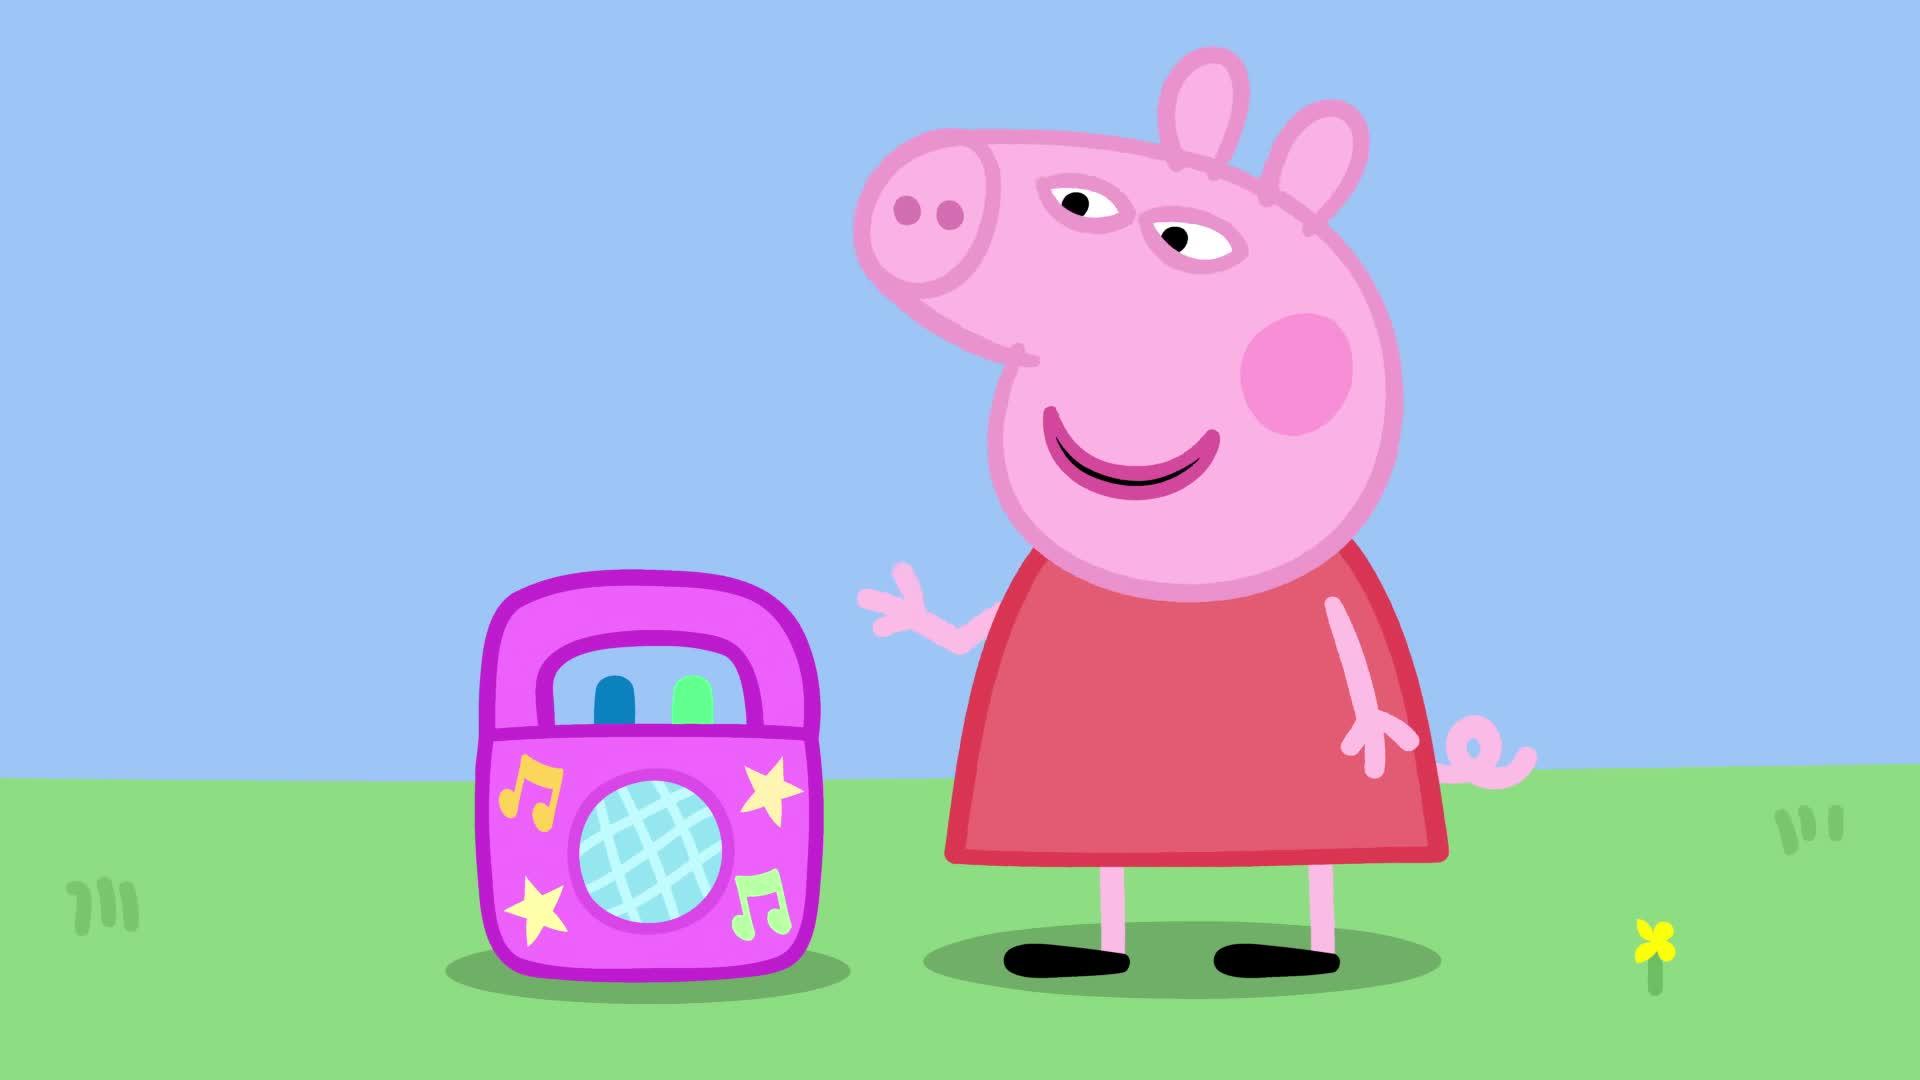 Peppa Pig English Episodes Dancing Compilation New 2017 Peppa Pig